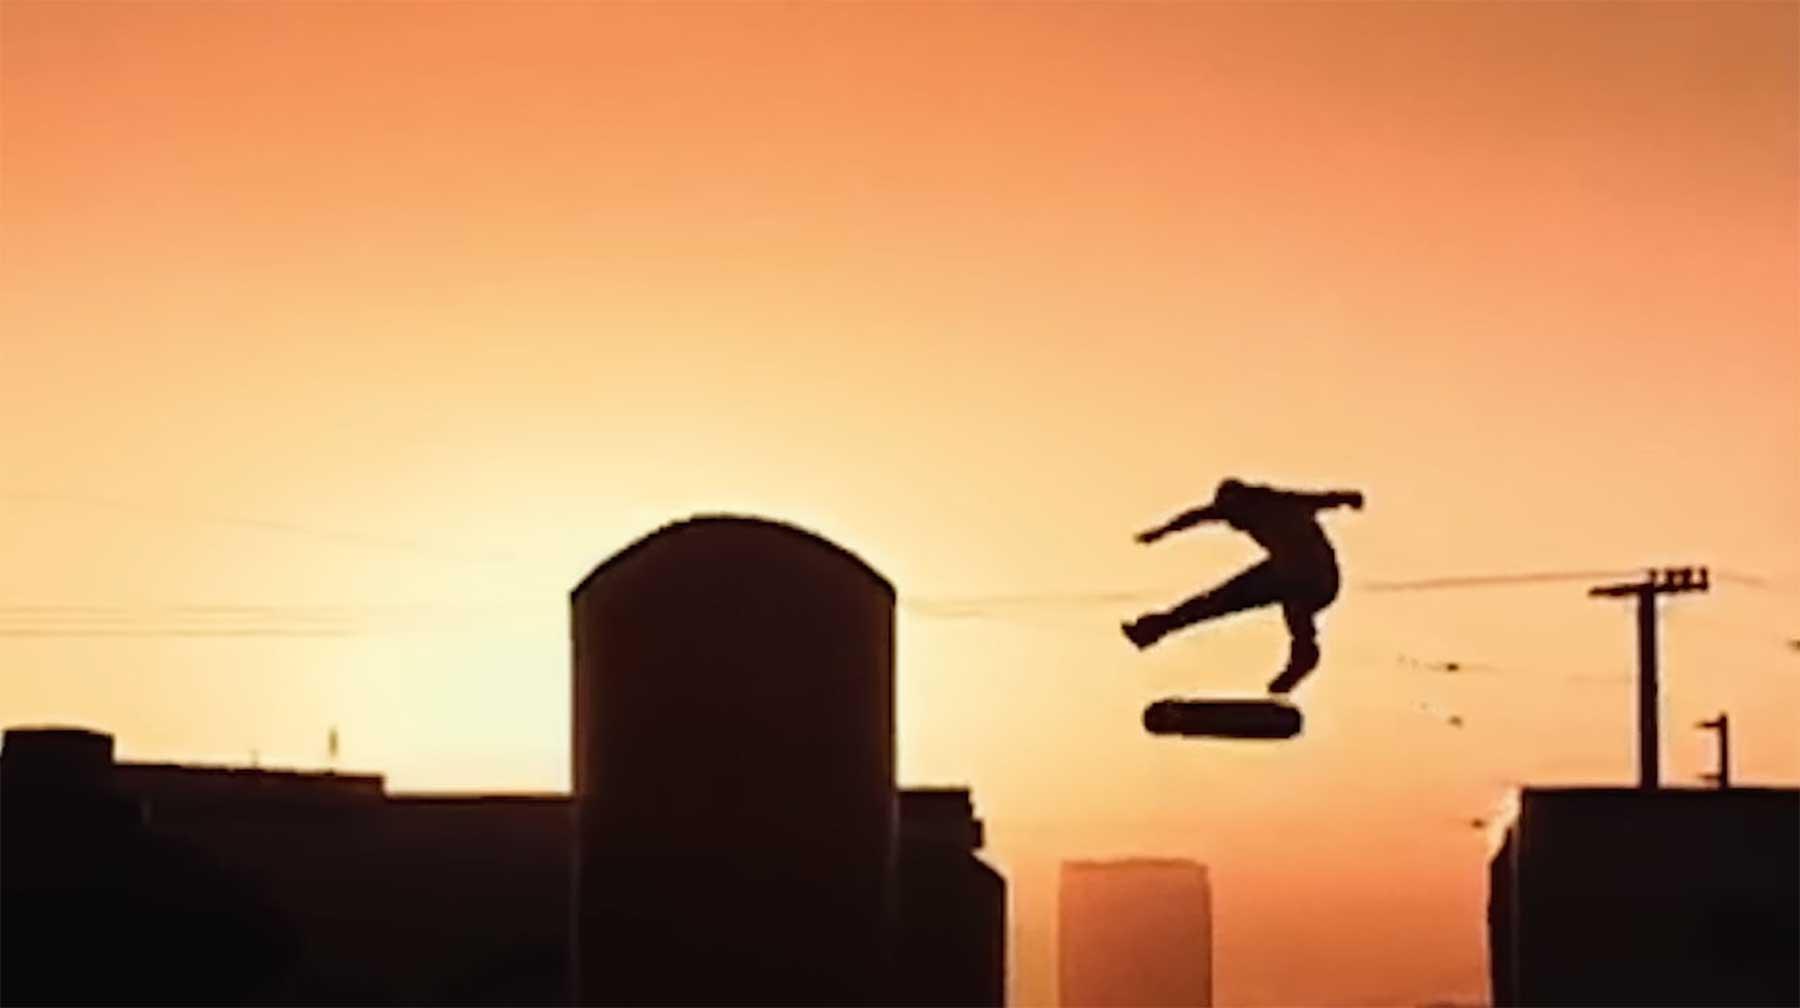 Dokumentation über Skateboard-Profi Daewon Song